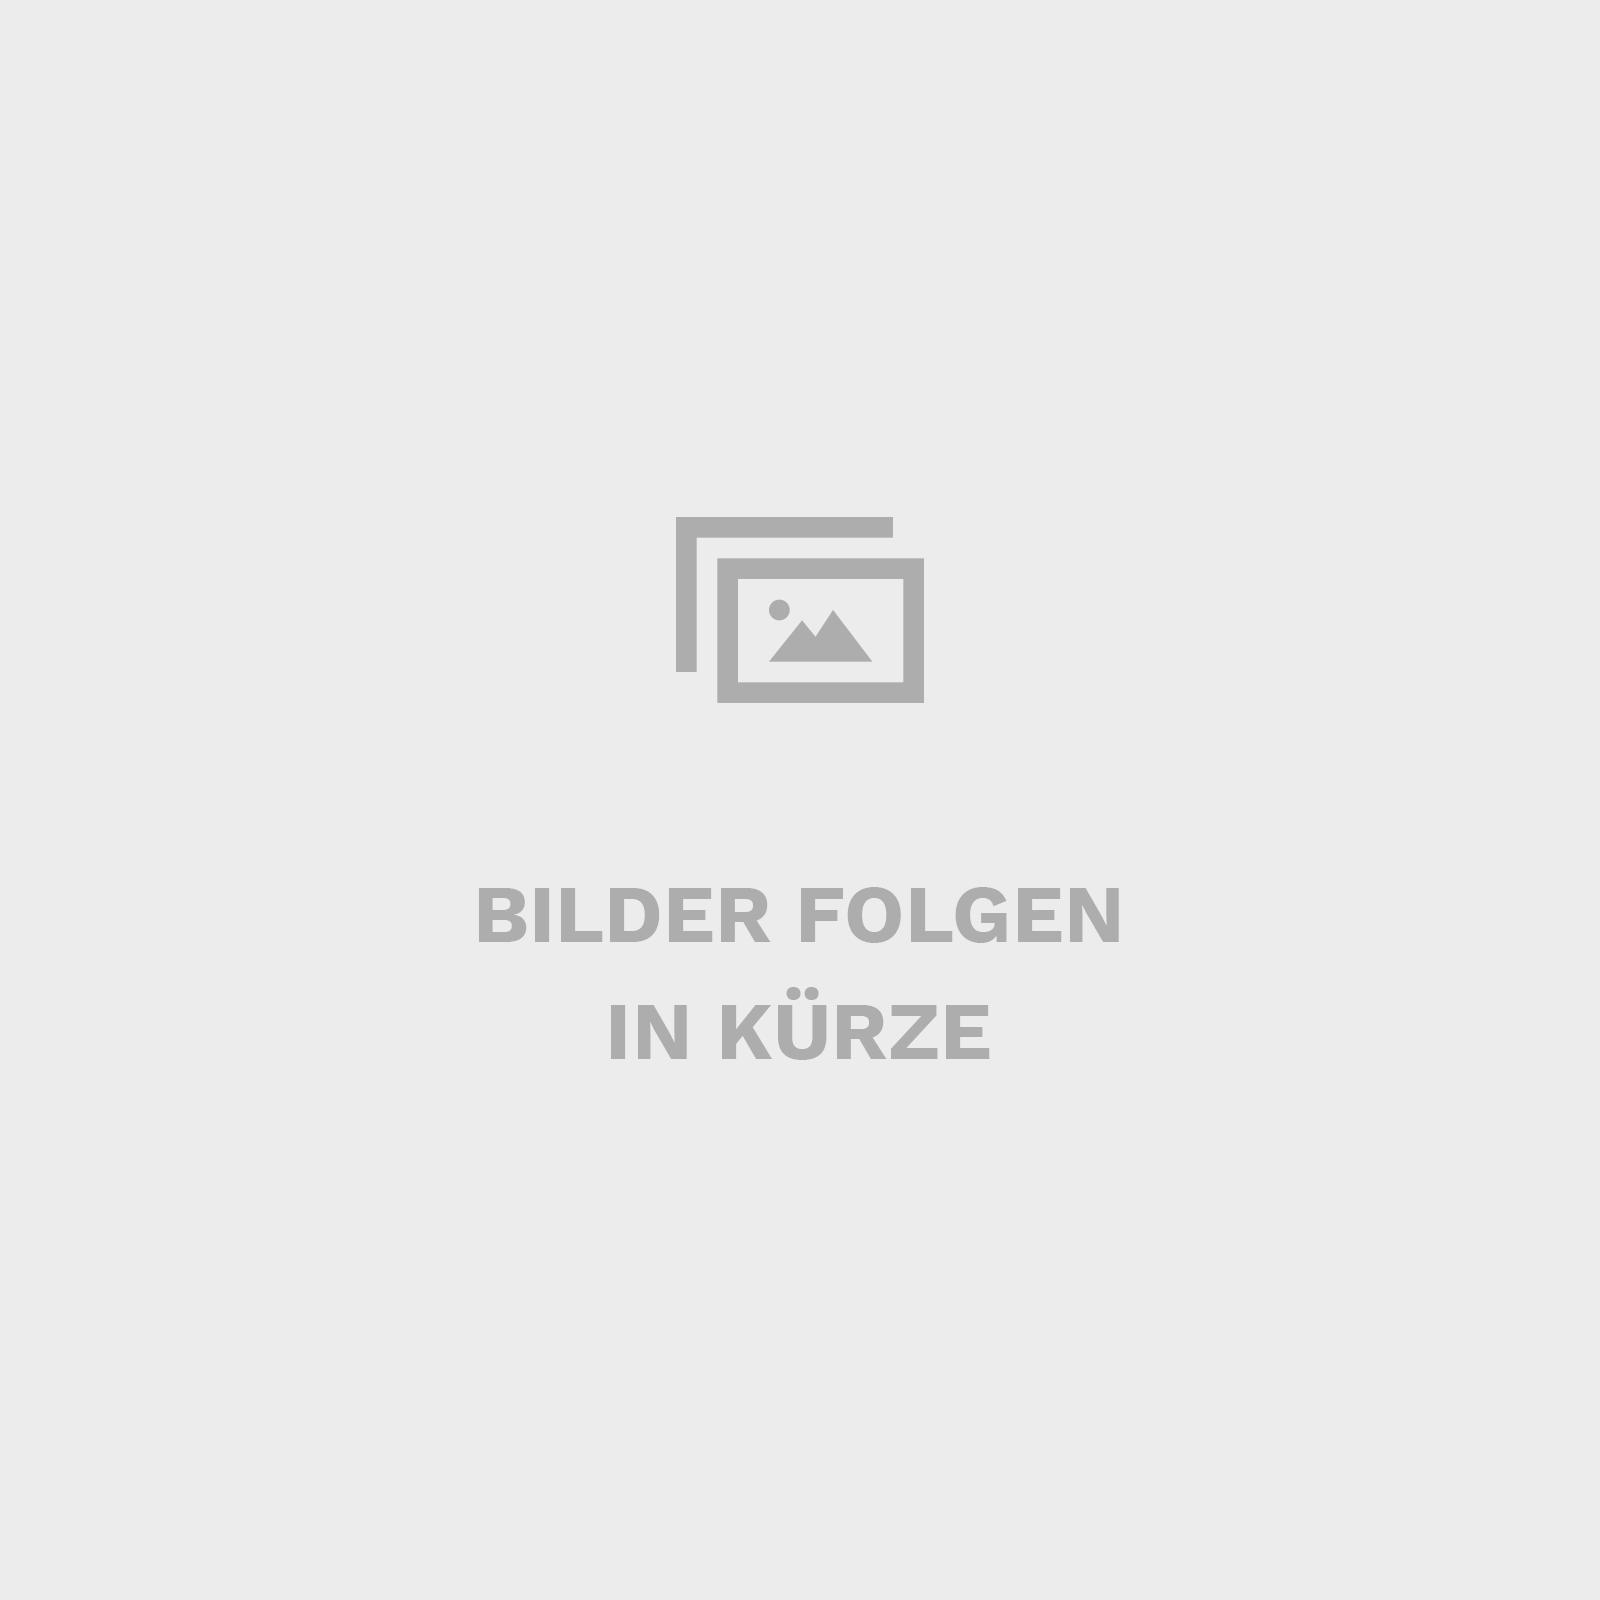 Farbe coal/ schwarz unbeleuchtet